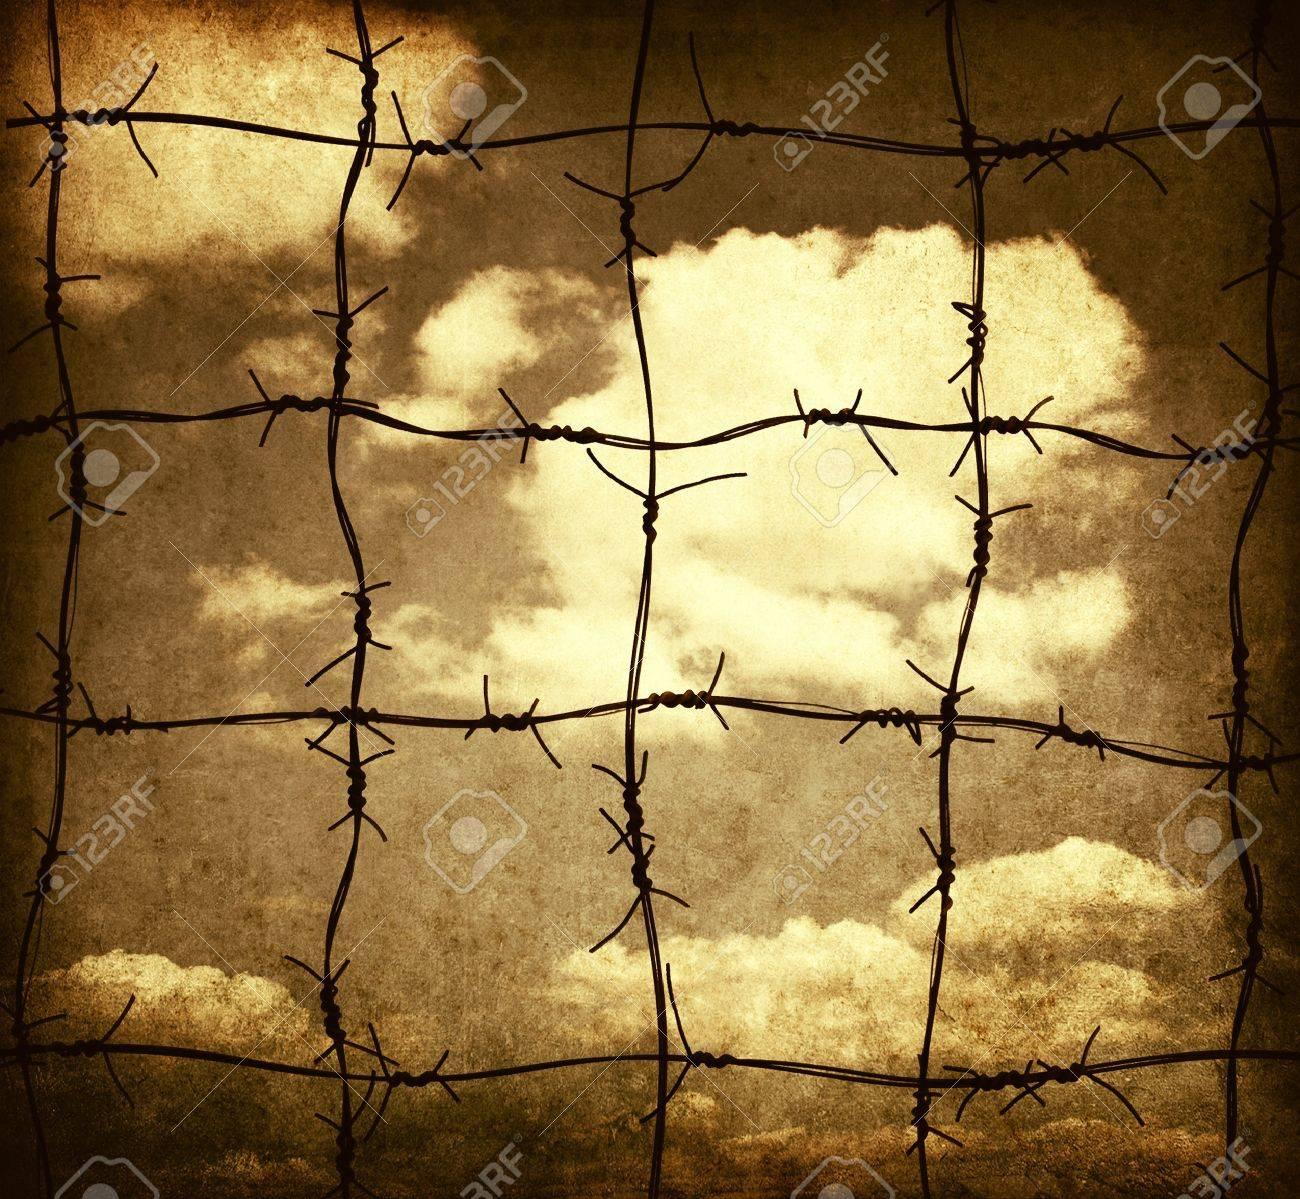 Barbed wire against sky, grunge illustration Stock Illustration - 15104087